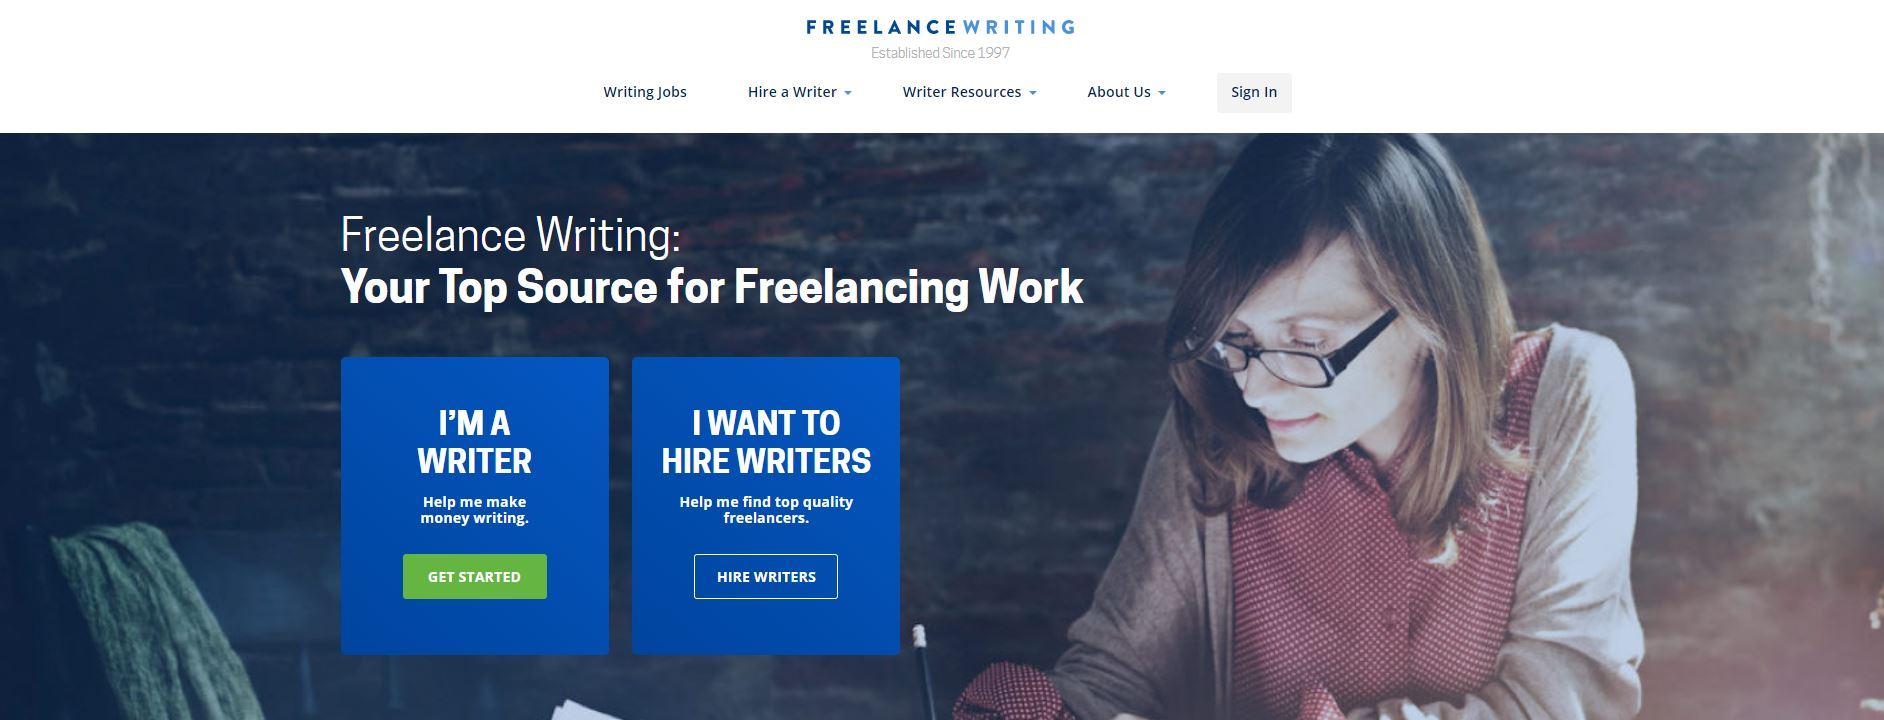 The Freelancewriting website homepage